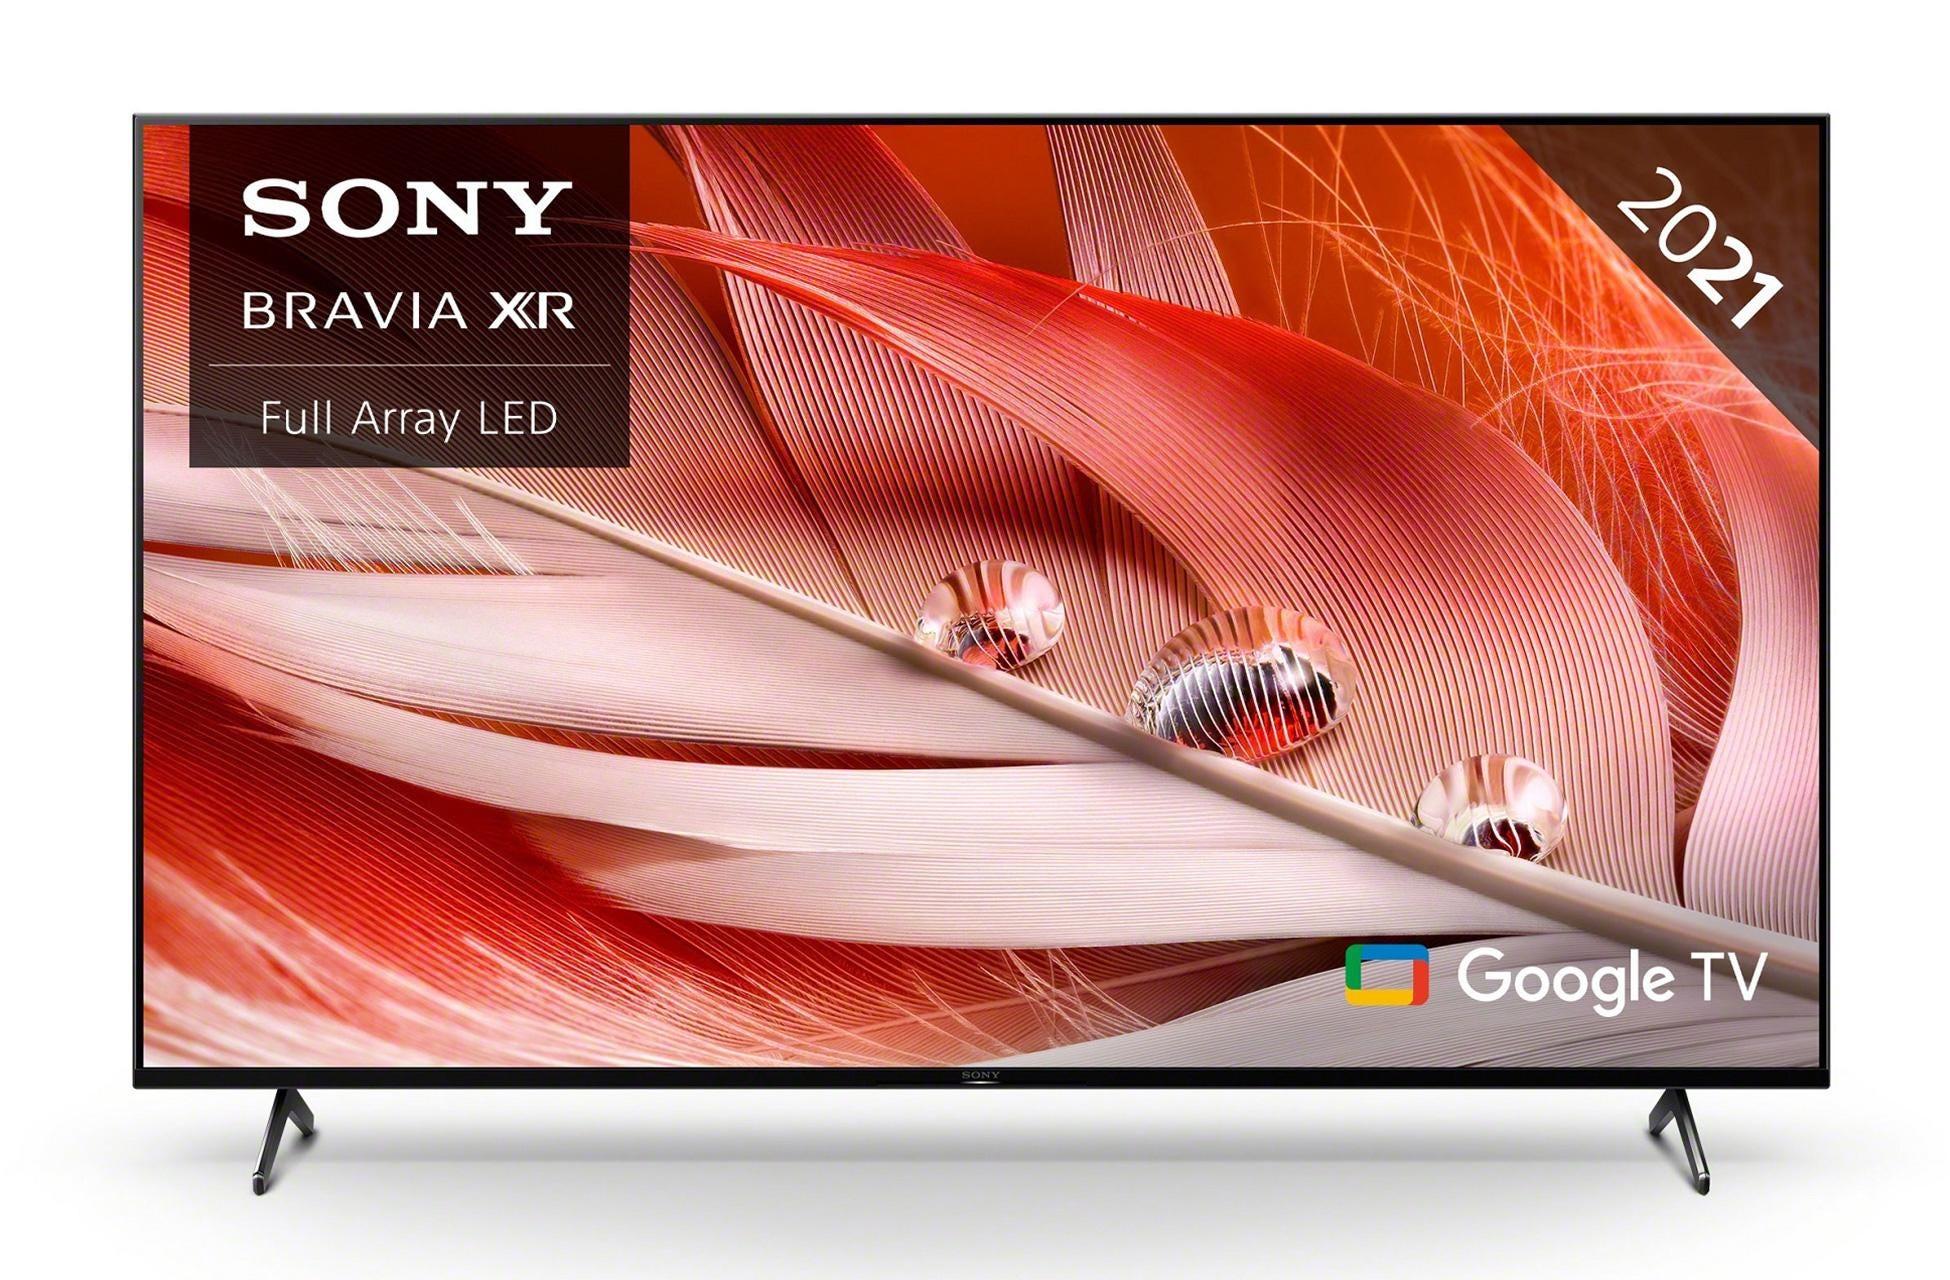 Sony BRAVIA XR55X90JU & HT-SD35 + FREE Sony HSTD35 soundbar & subwoofer worth £199 - £1399 at Richer Sounds